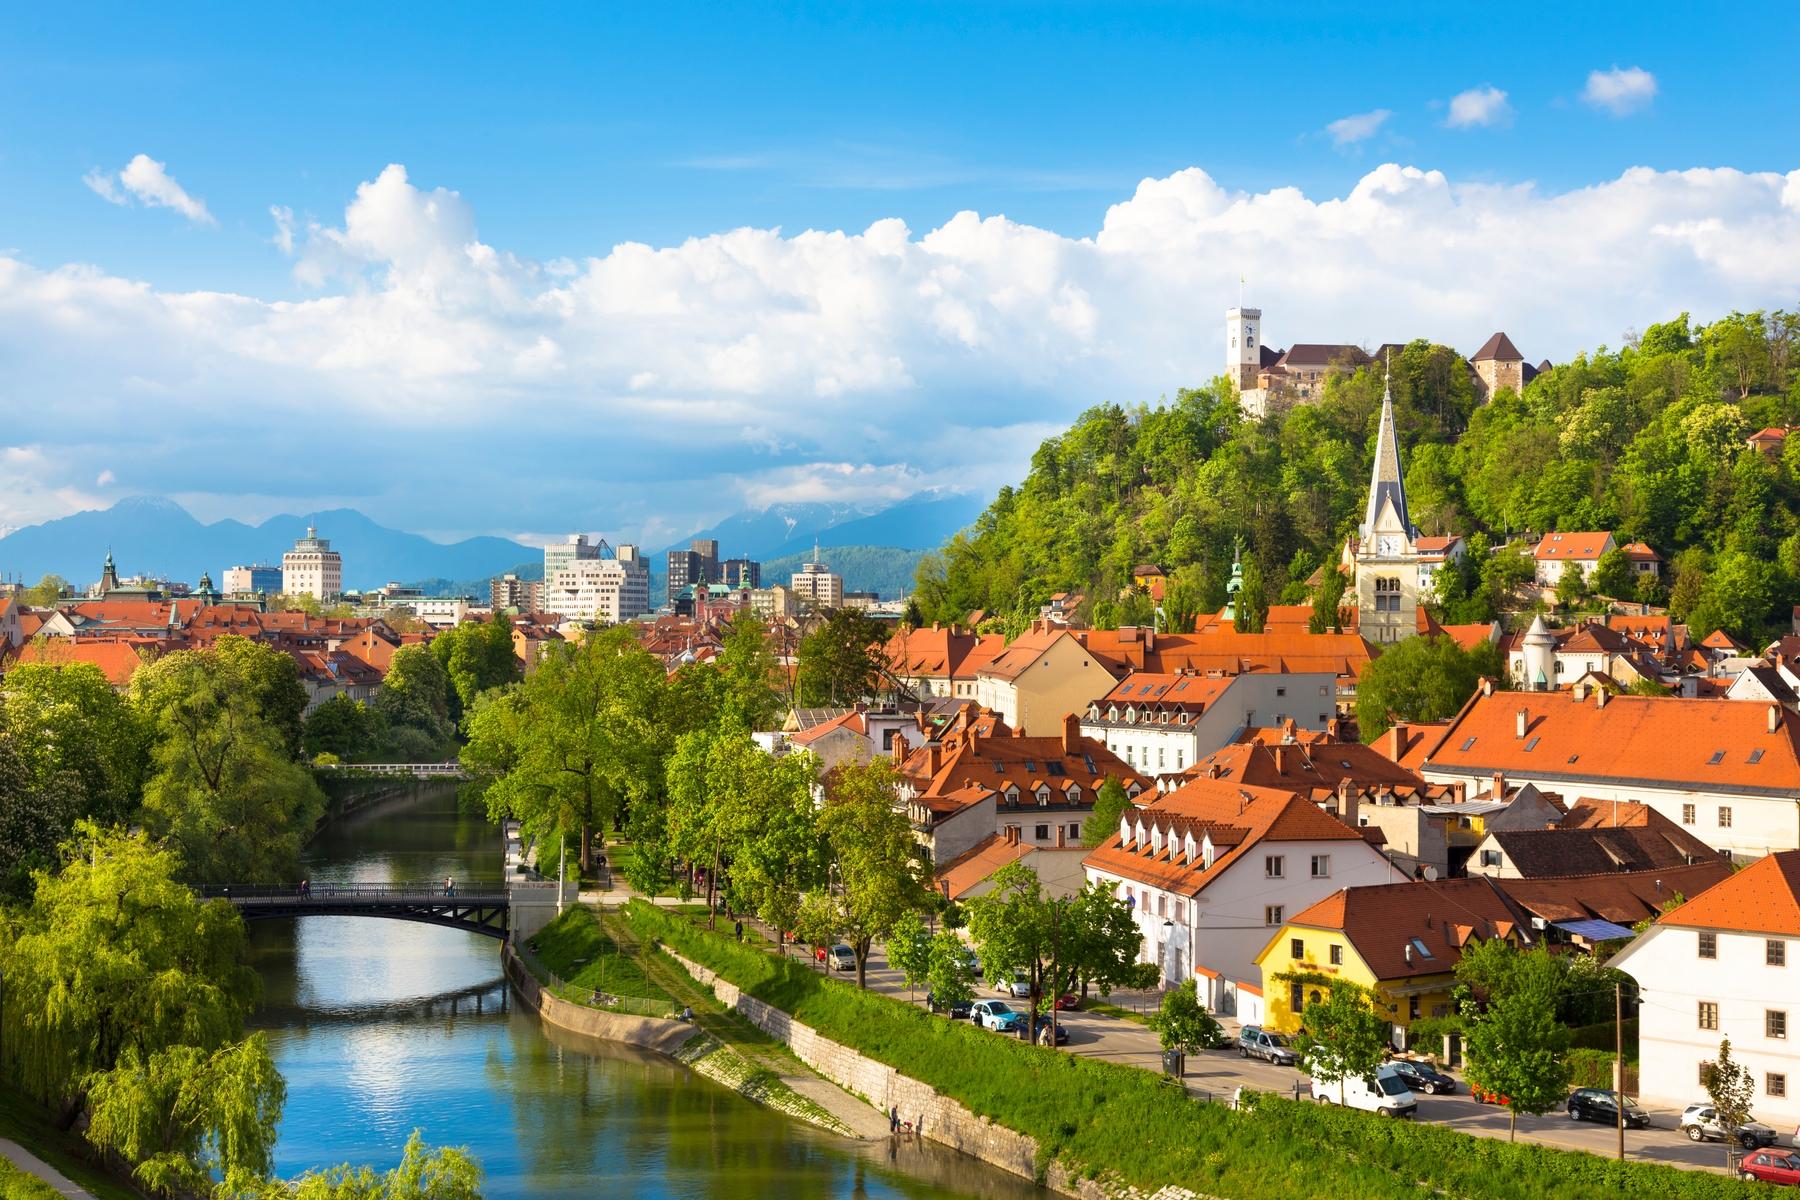 Blue skies and greenery in Ljubljana, Slovenia.